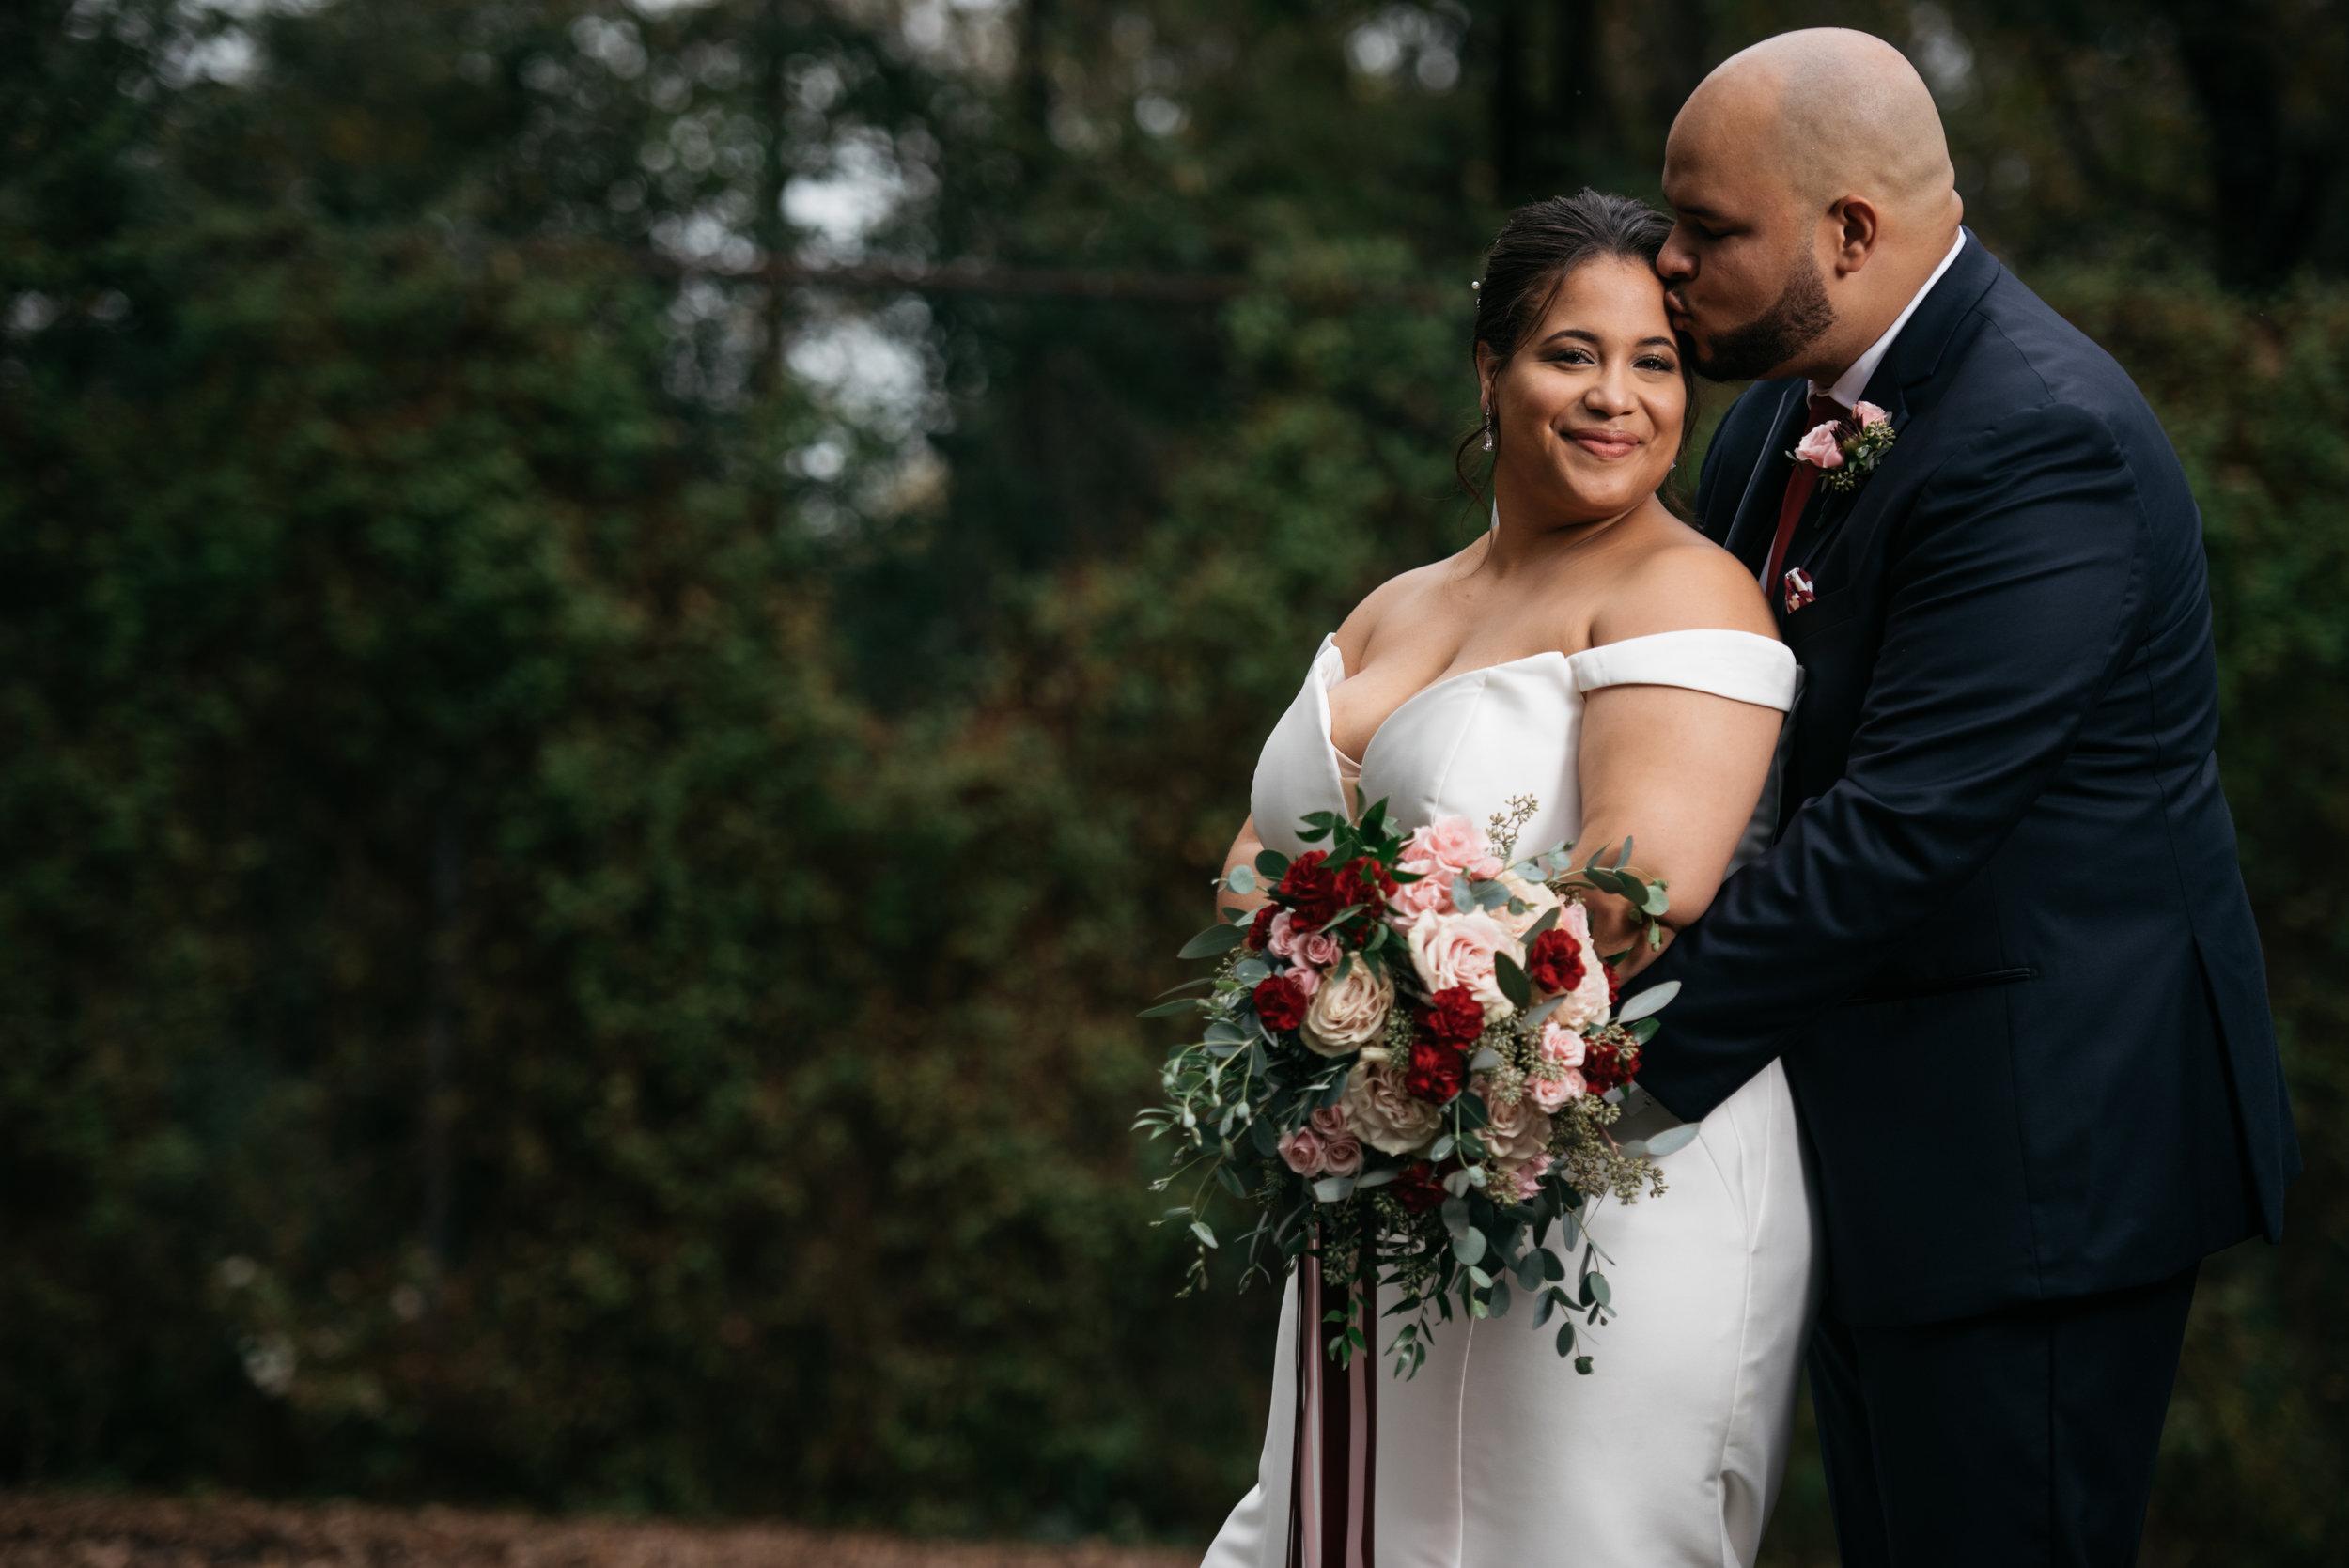 WeddingPhotos | NJPhotographer | Highlights-4-39.jpg